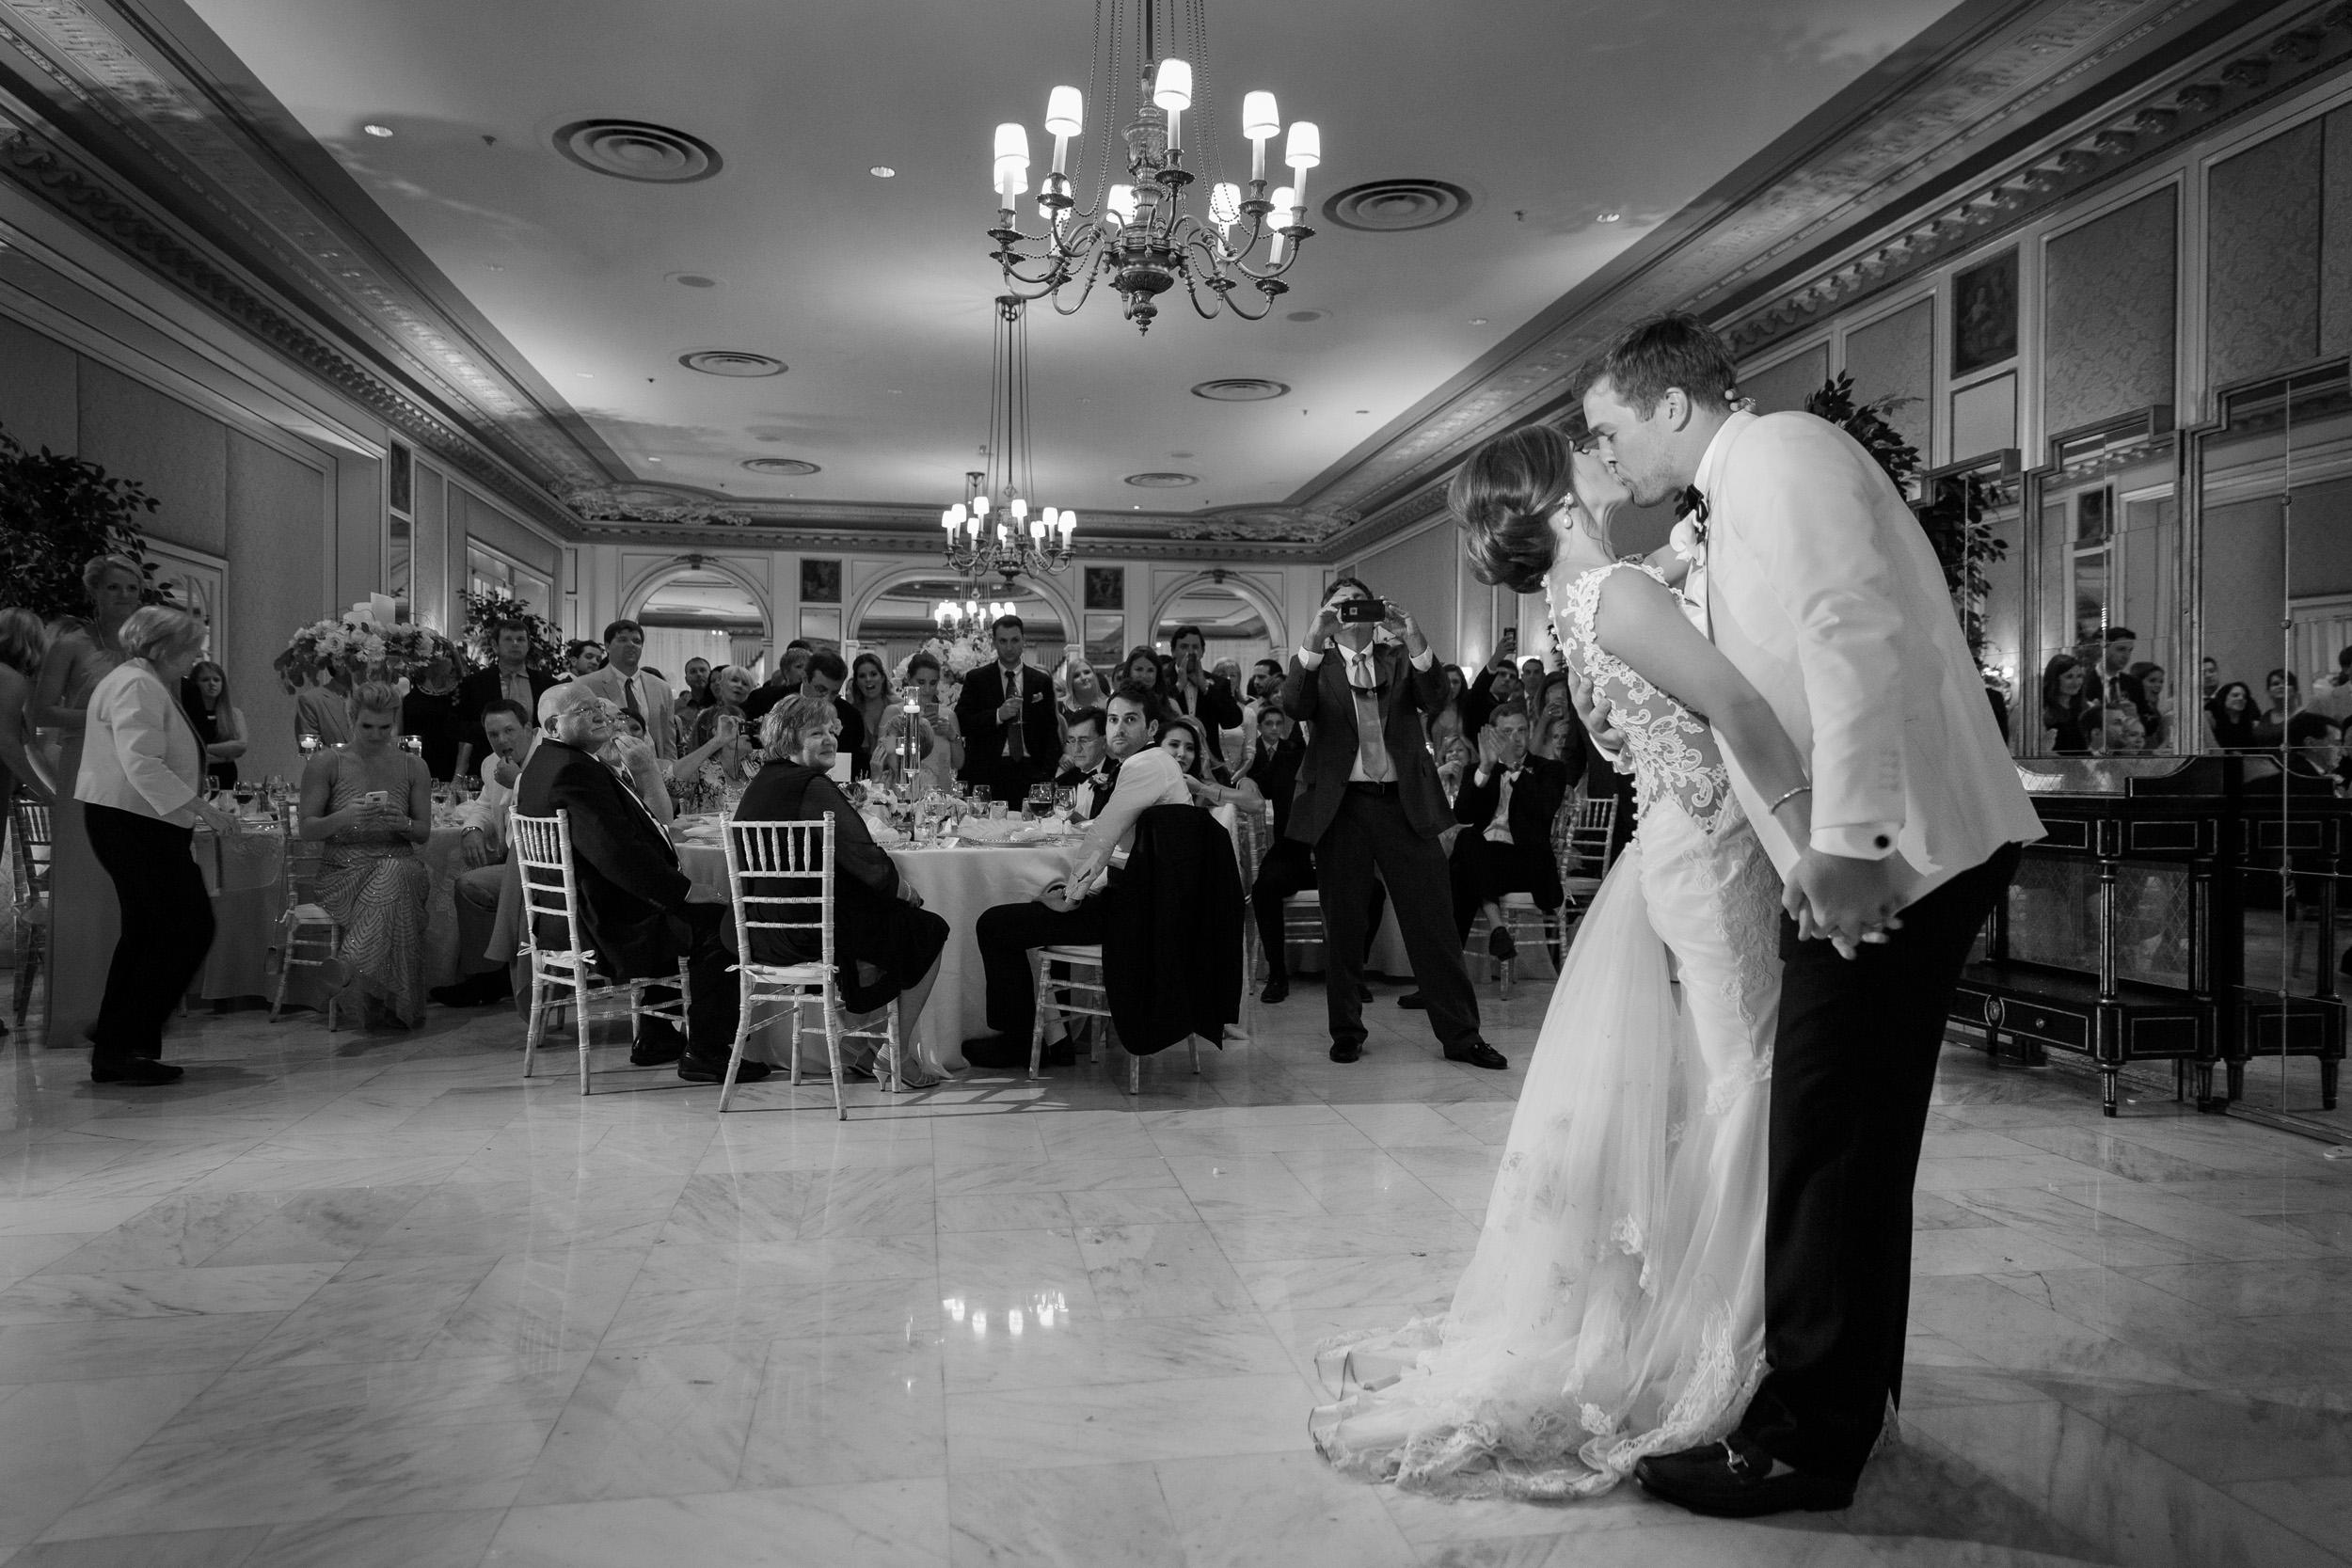 Colorado-Springs-Wedding-Photography-SS-009.jpg